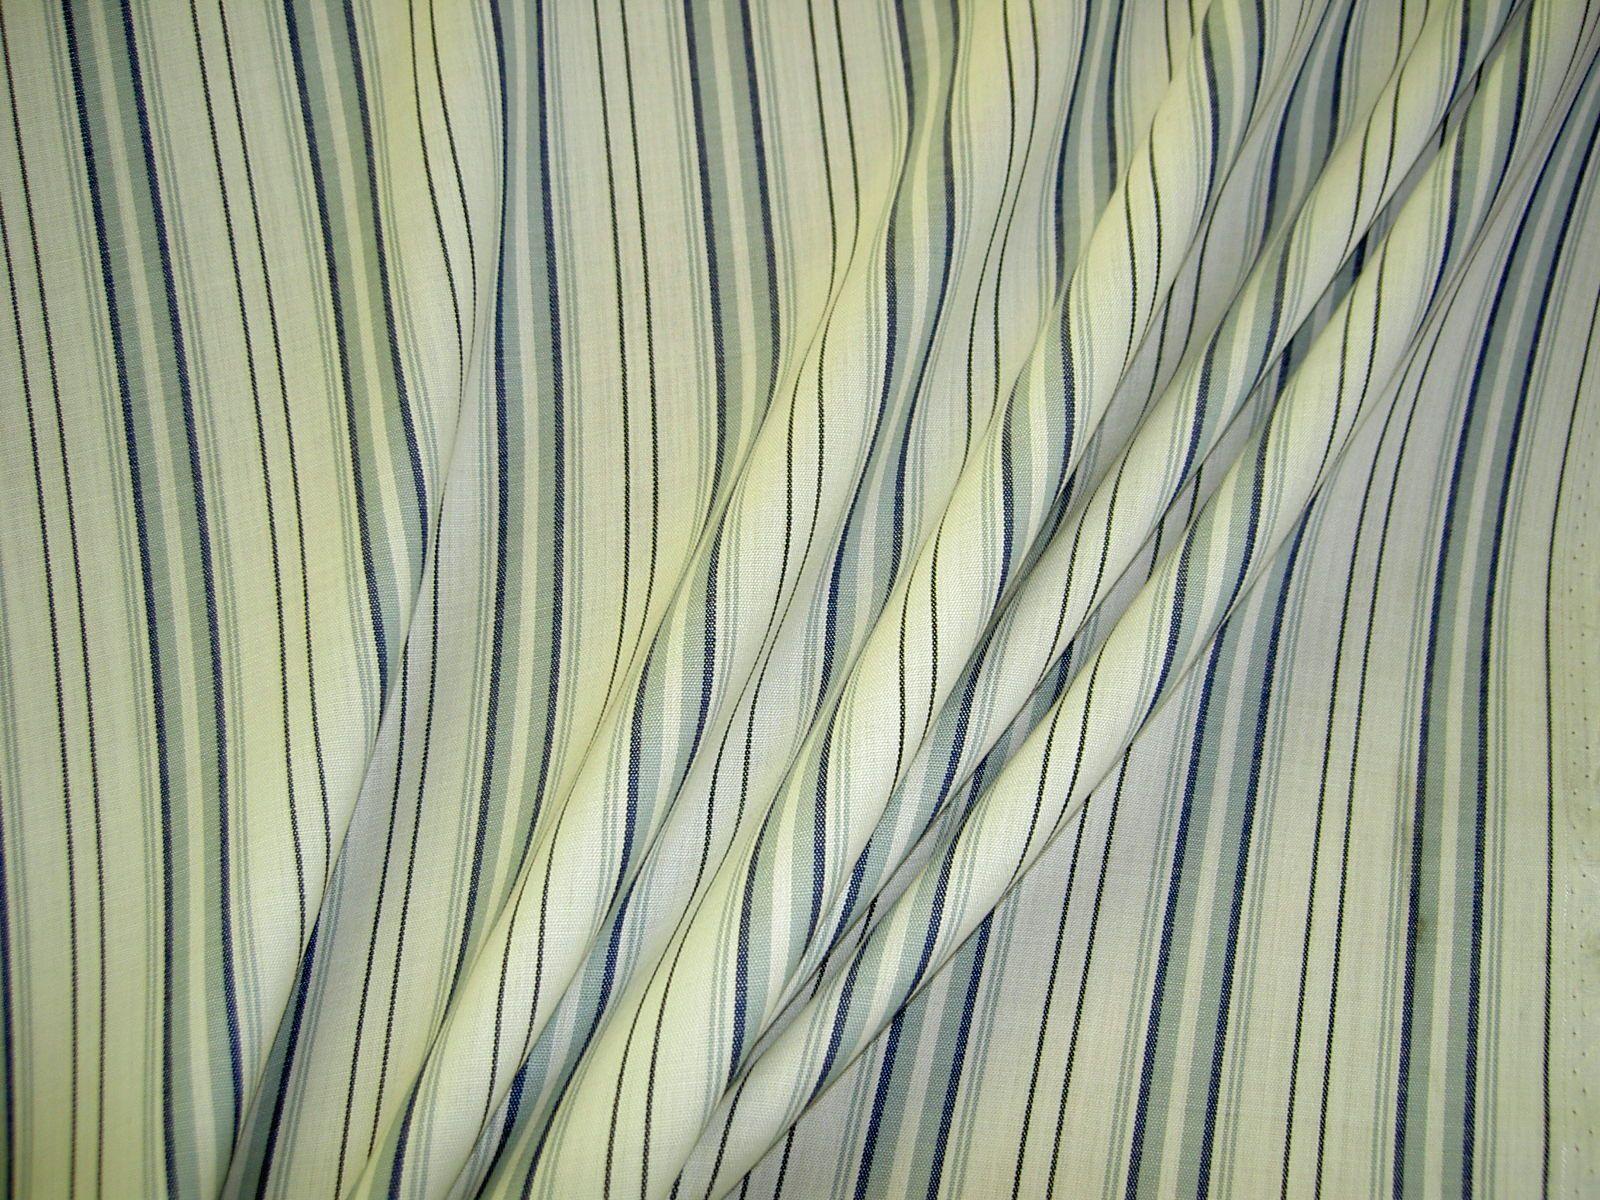 Folia Ralph Lauren Wool Stinbury Sheer Blue Closeout Home Decor Fabric